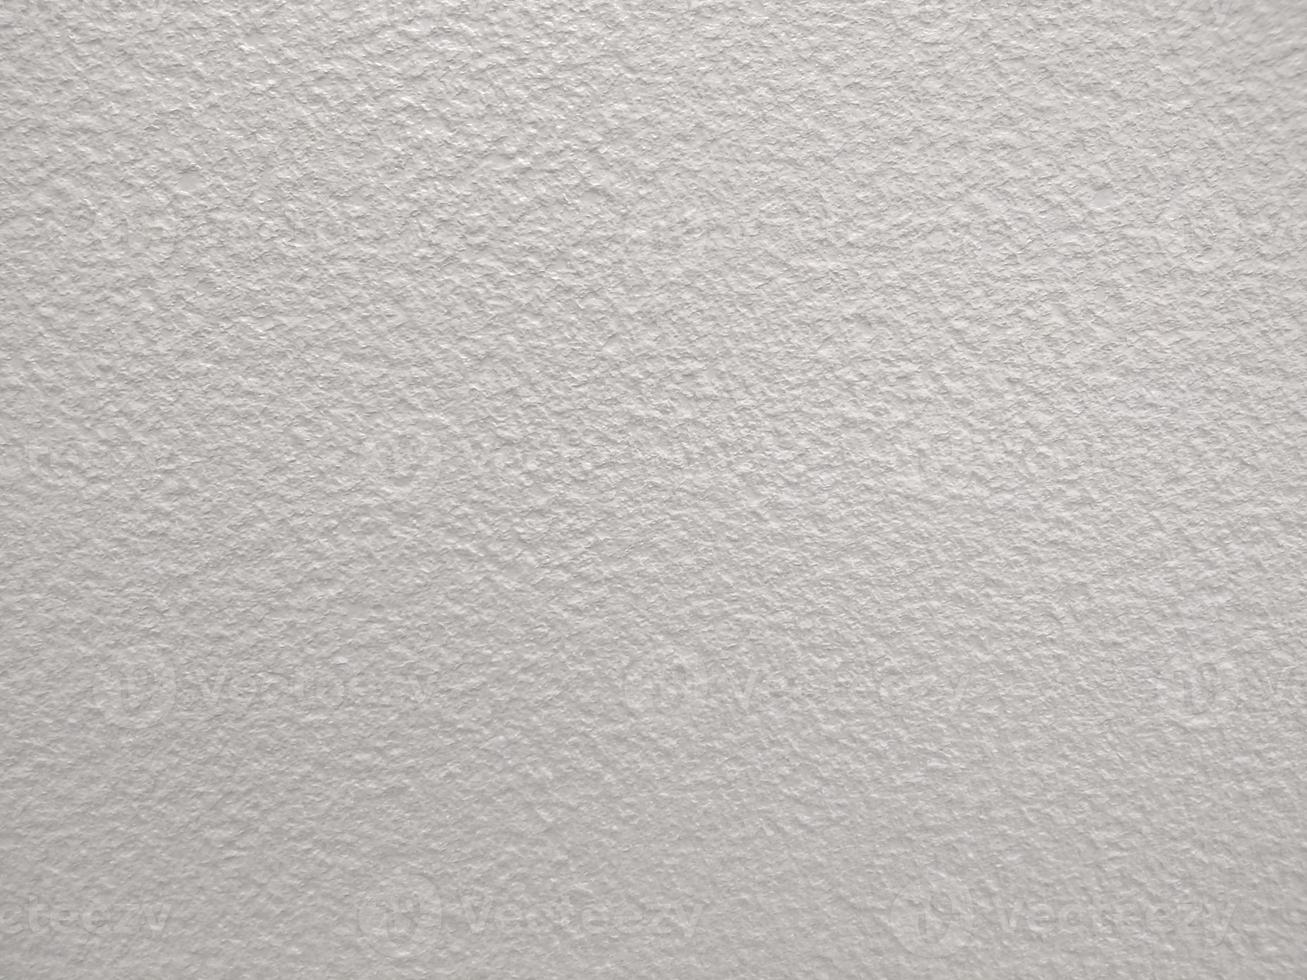 textura áspera cinza foto